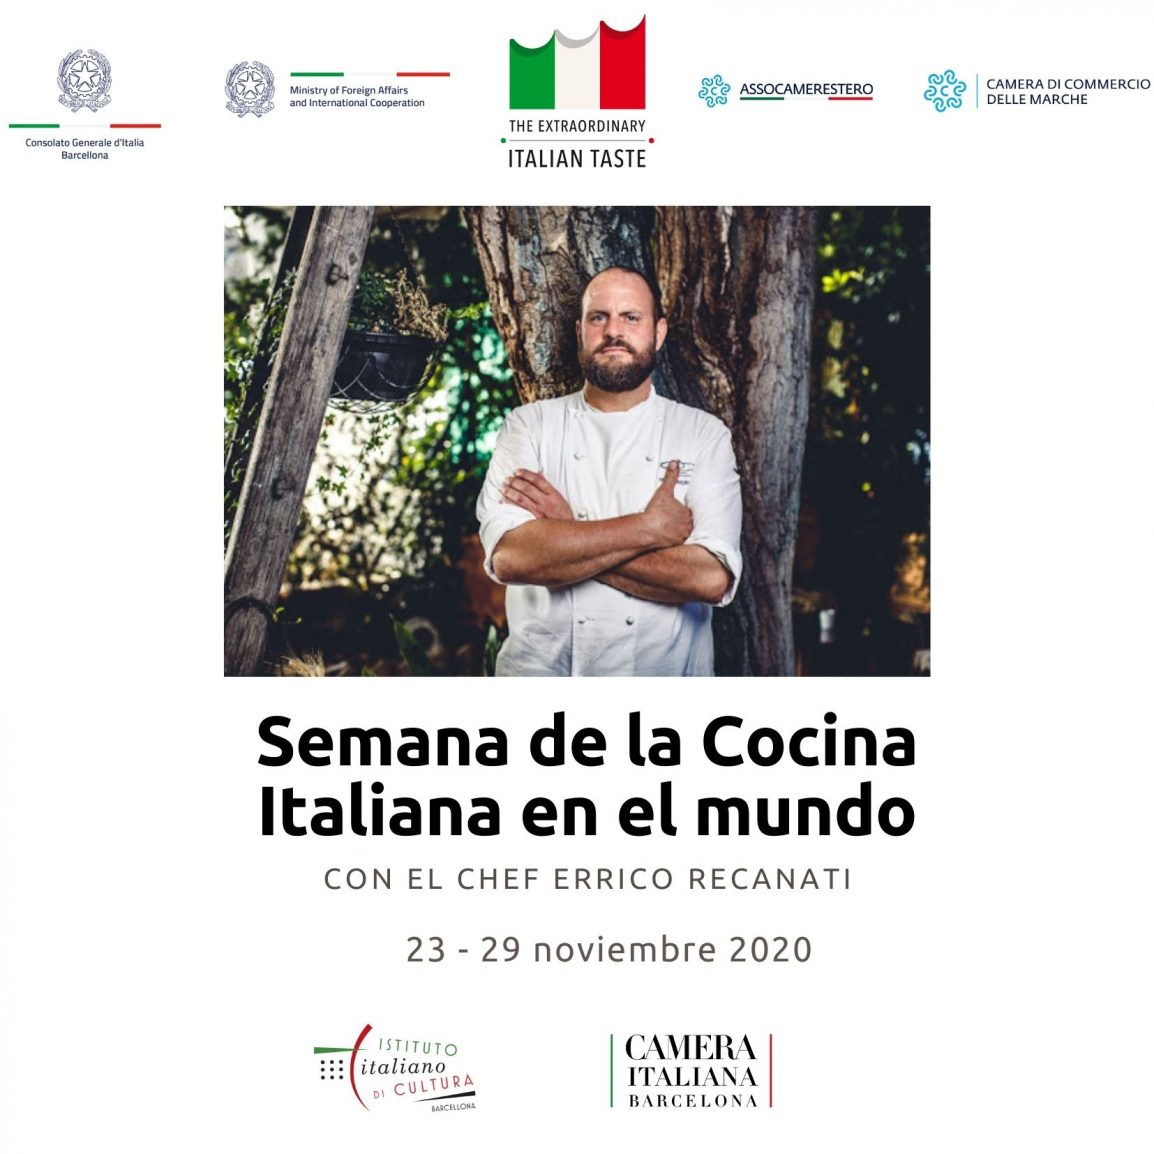 Semana-de-la-Cocina-Italiana-en-el-mundo-e1606206493941